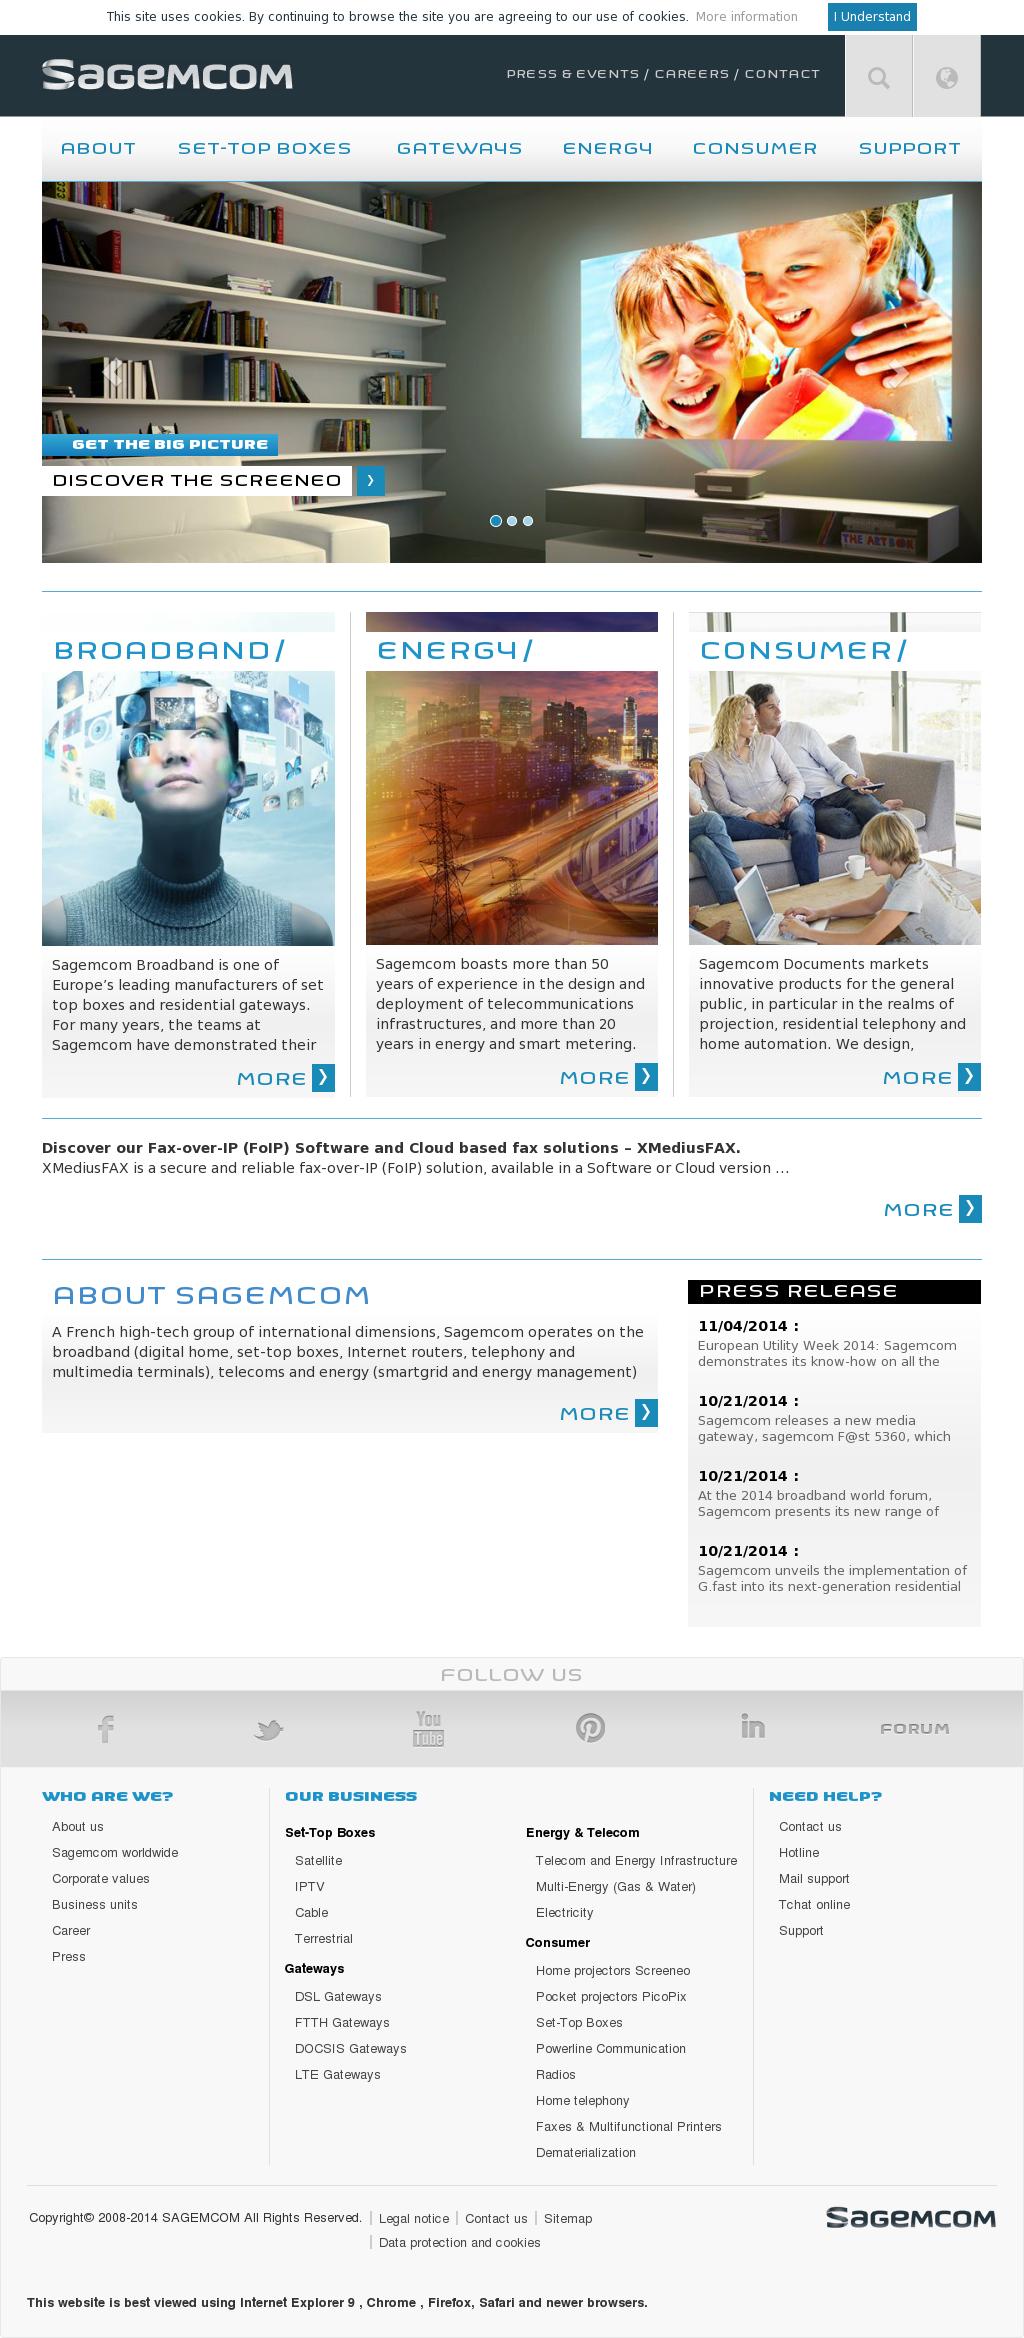 Sagemcom Competitors, Revenue and Employees - Owler Company Profile